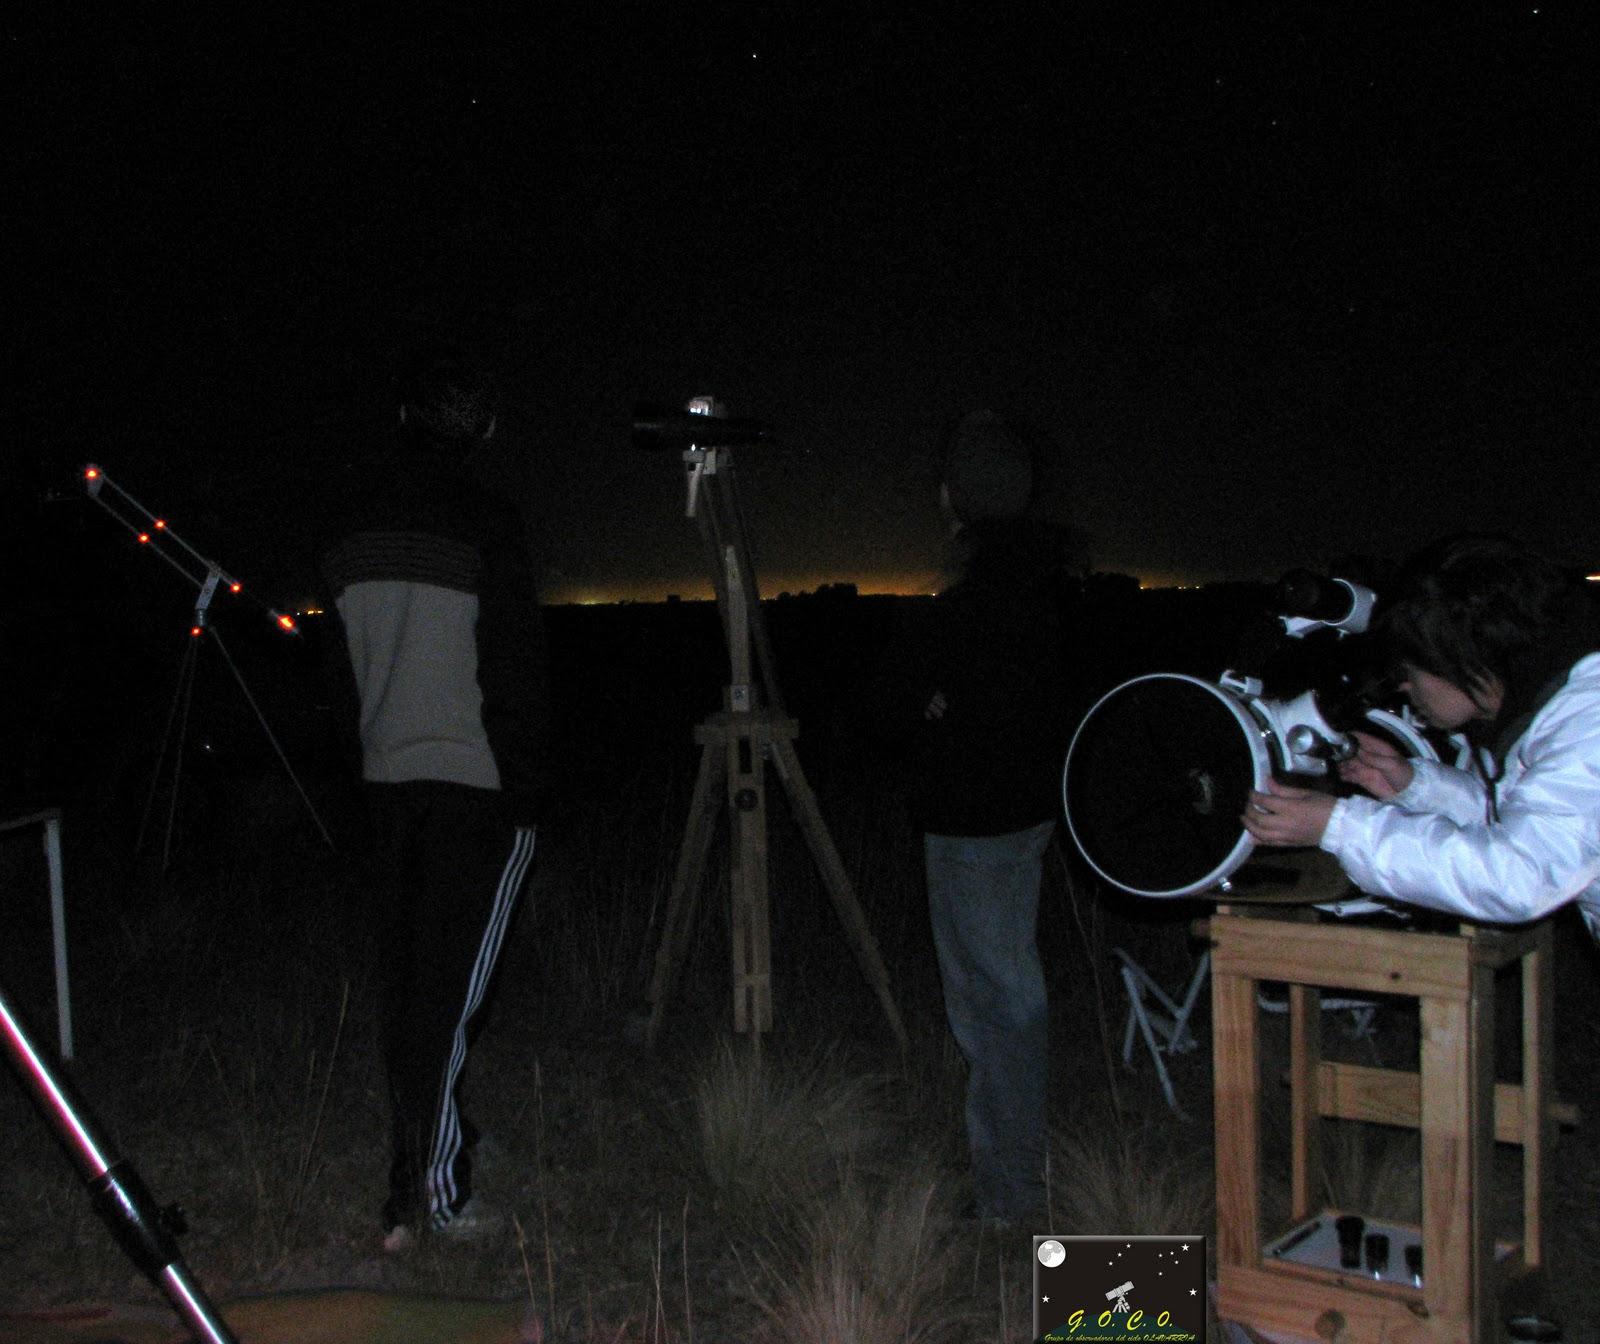 GOCO: 2011